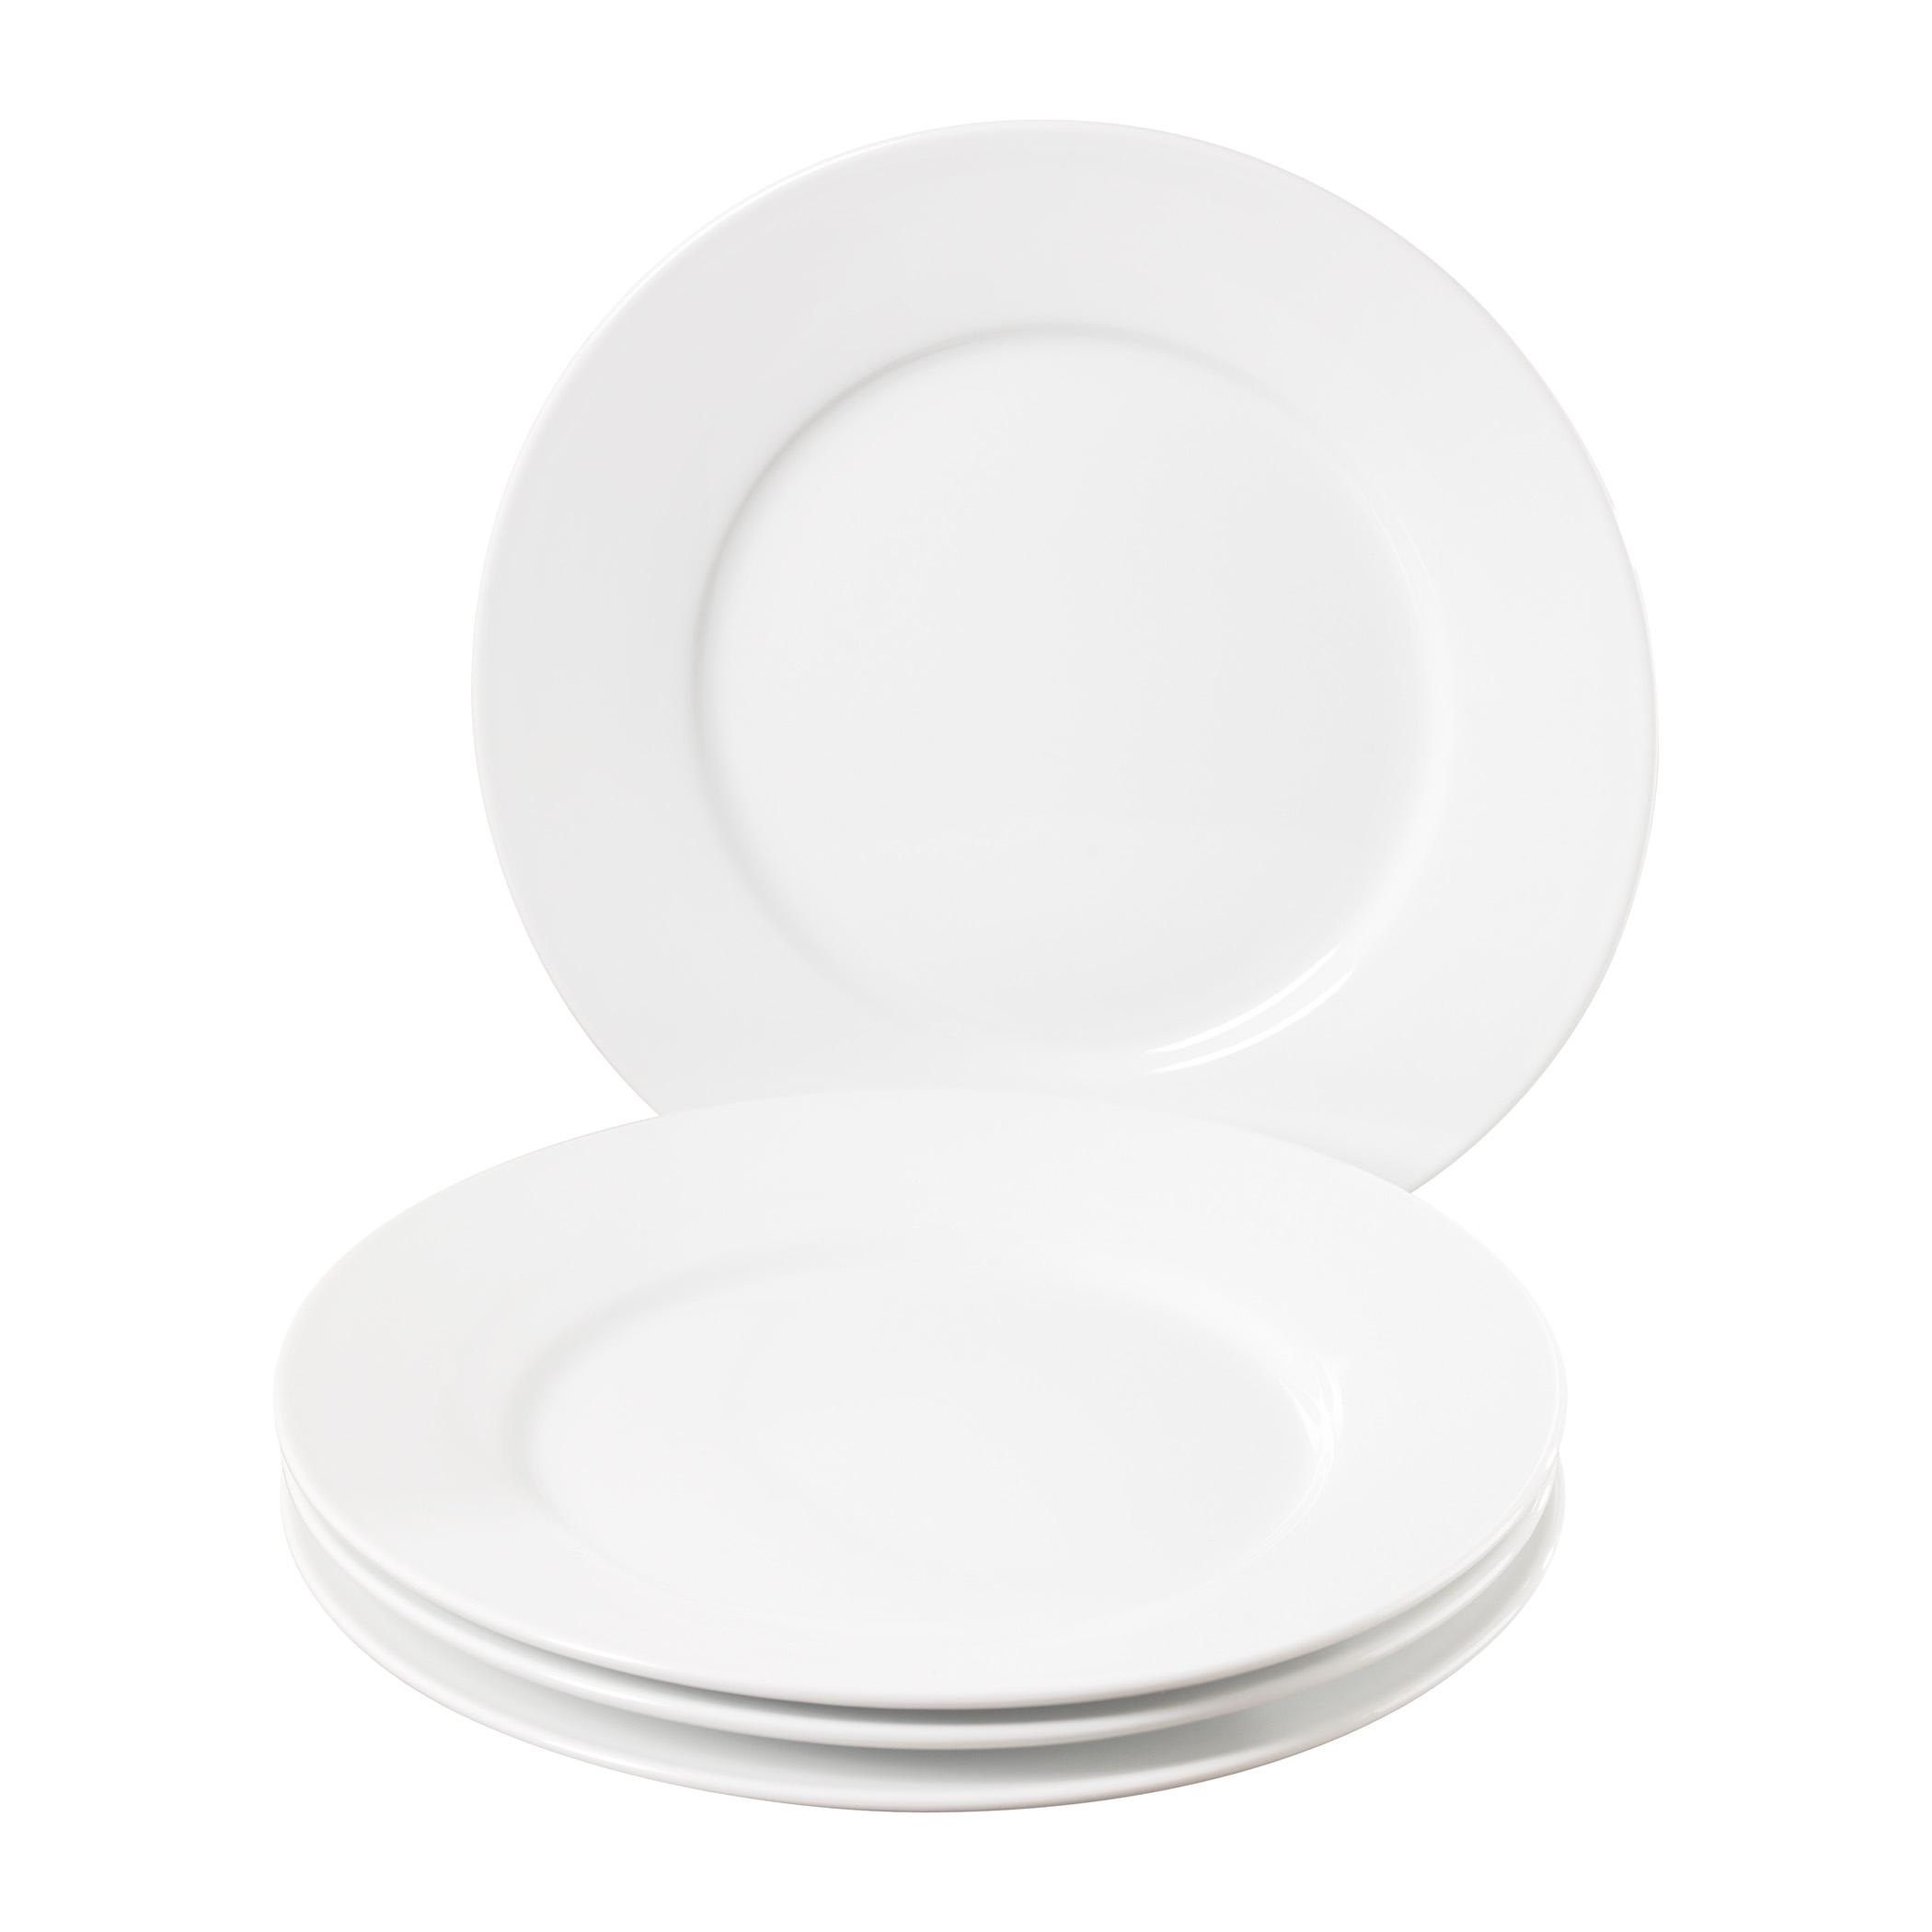 set of four  inch round porcelain salad plates by denmark tools  - ttuqecset of four  inch porcelain salad plates by denmark